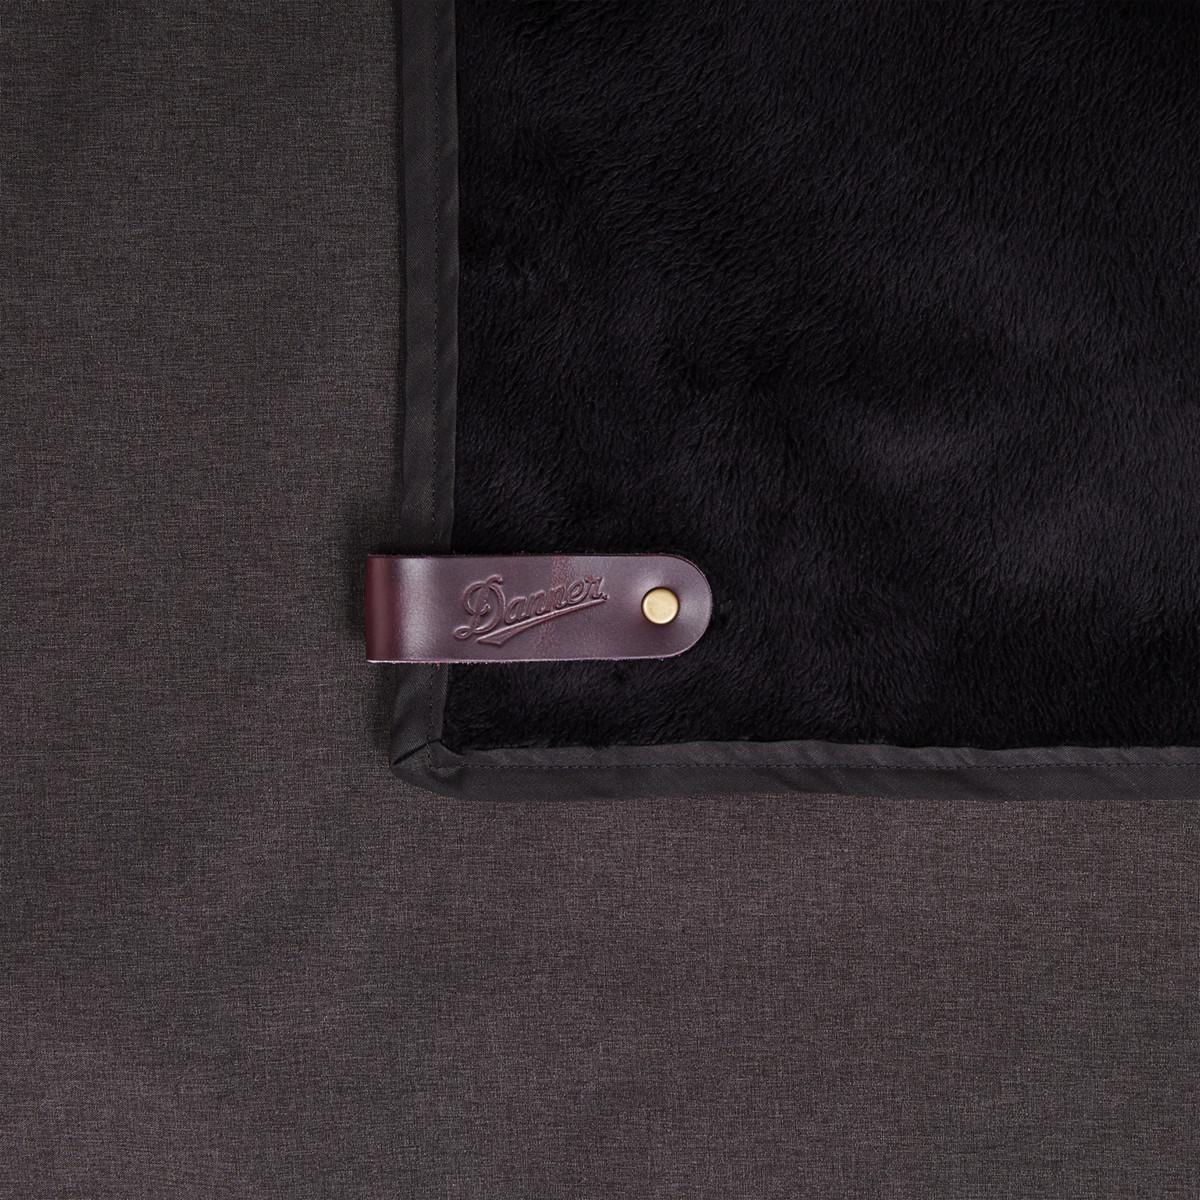 Belmont Blanket x Danner Hellagood - Black